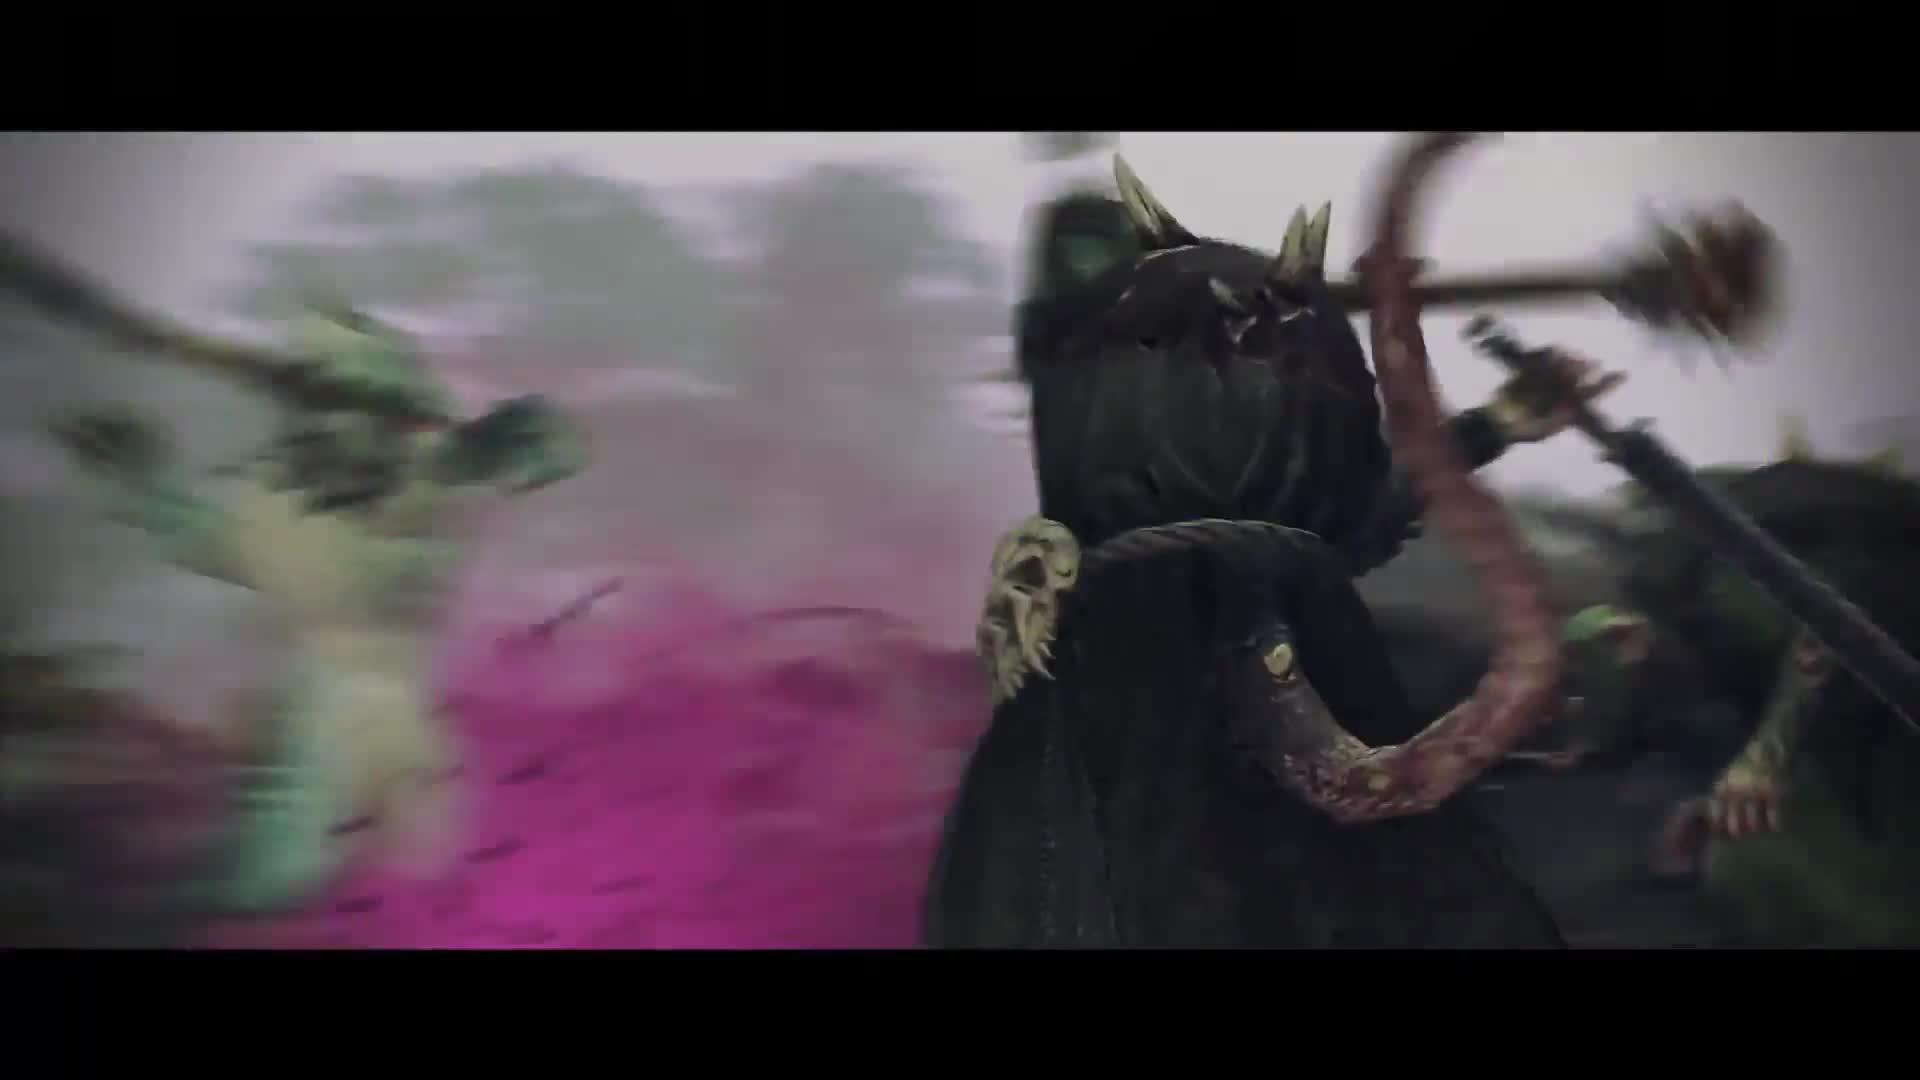 Total War: Warhammer 2 - Skaven Reveal Trailer